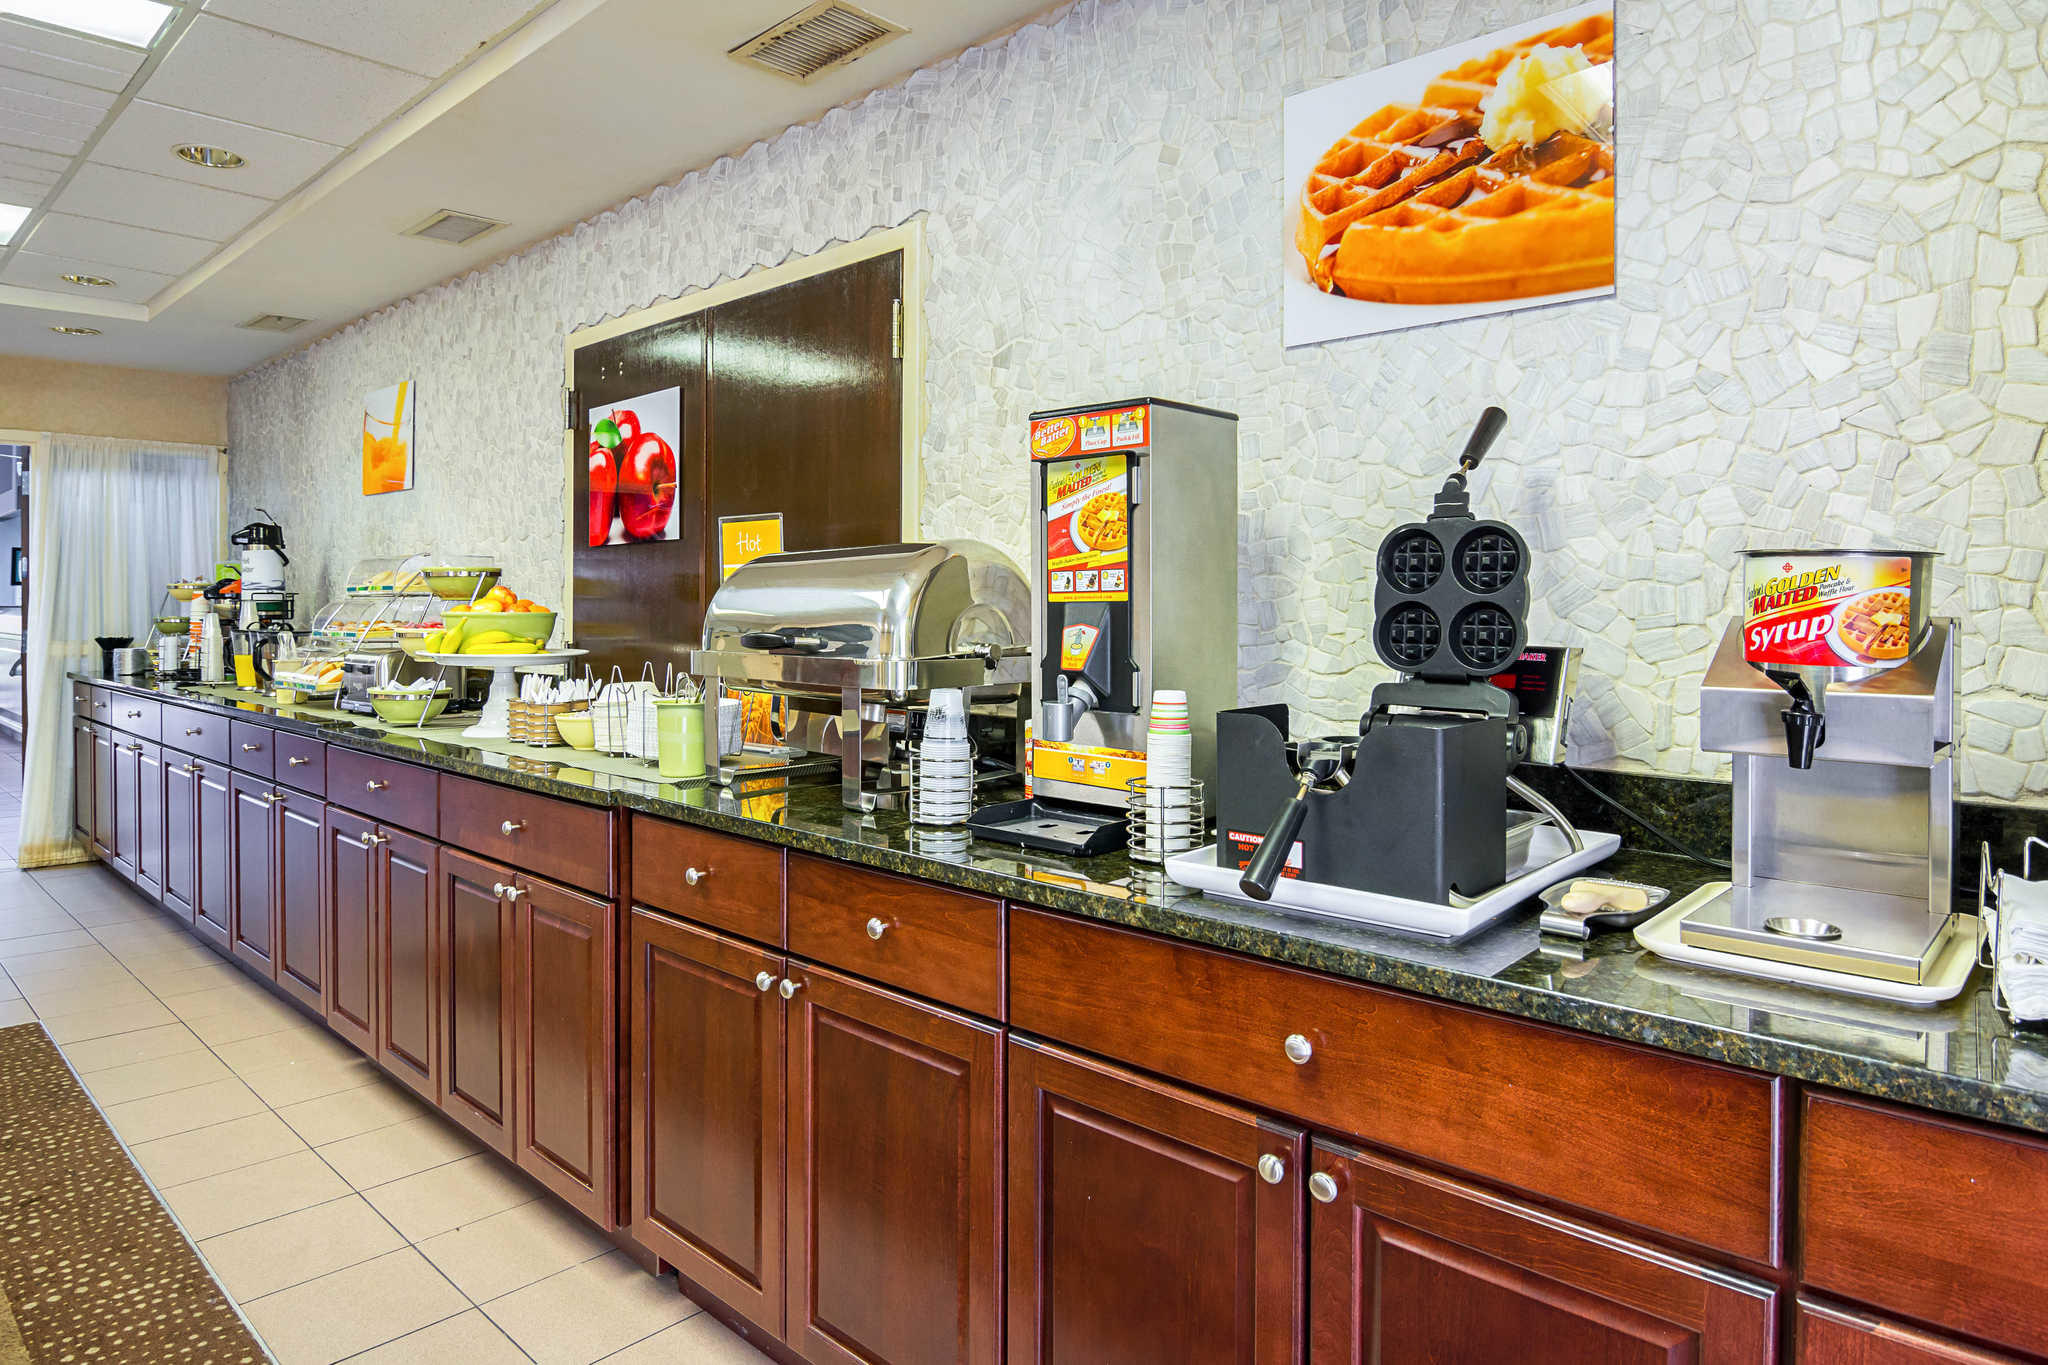 Quality Inn & Suites Kearneysville - Martinsburg image 21